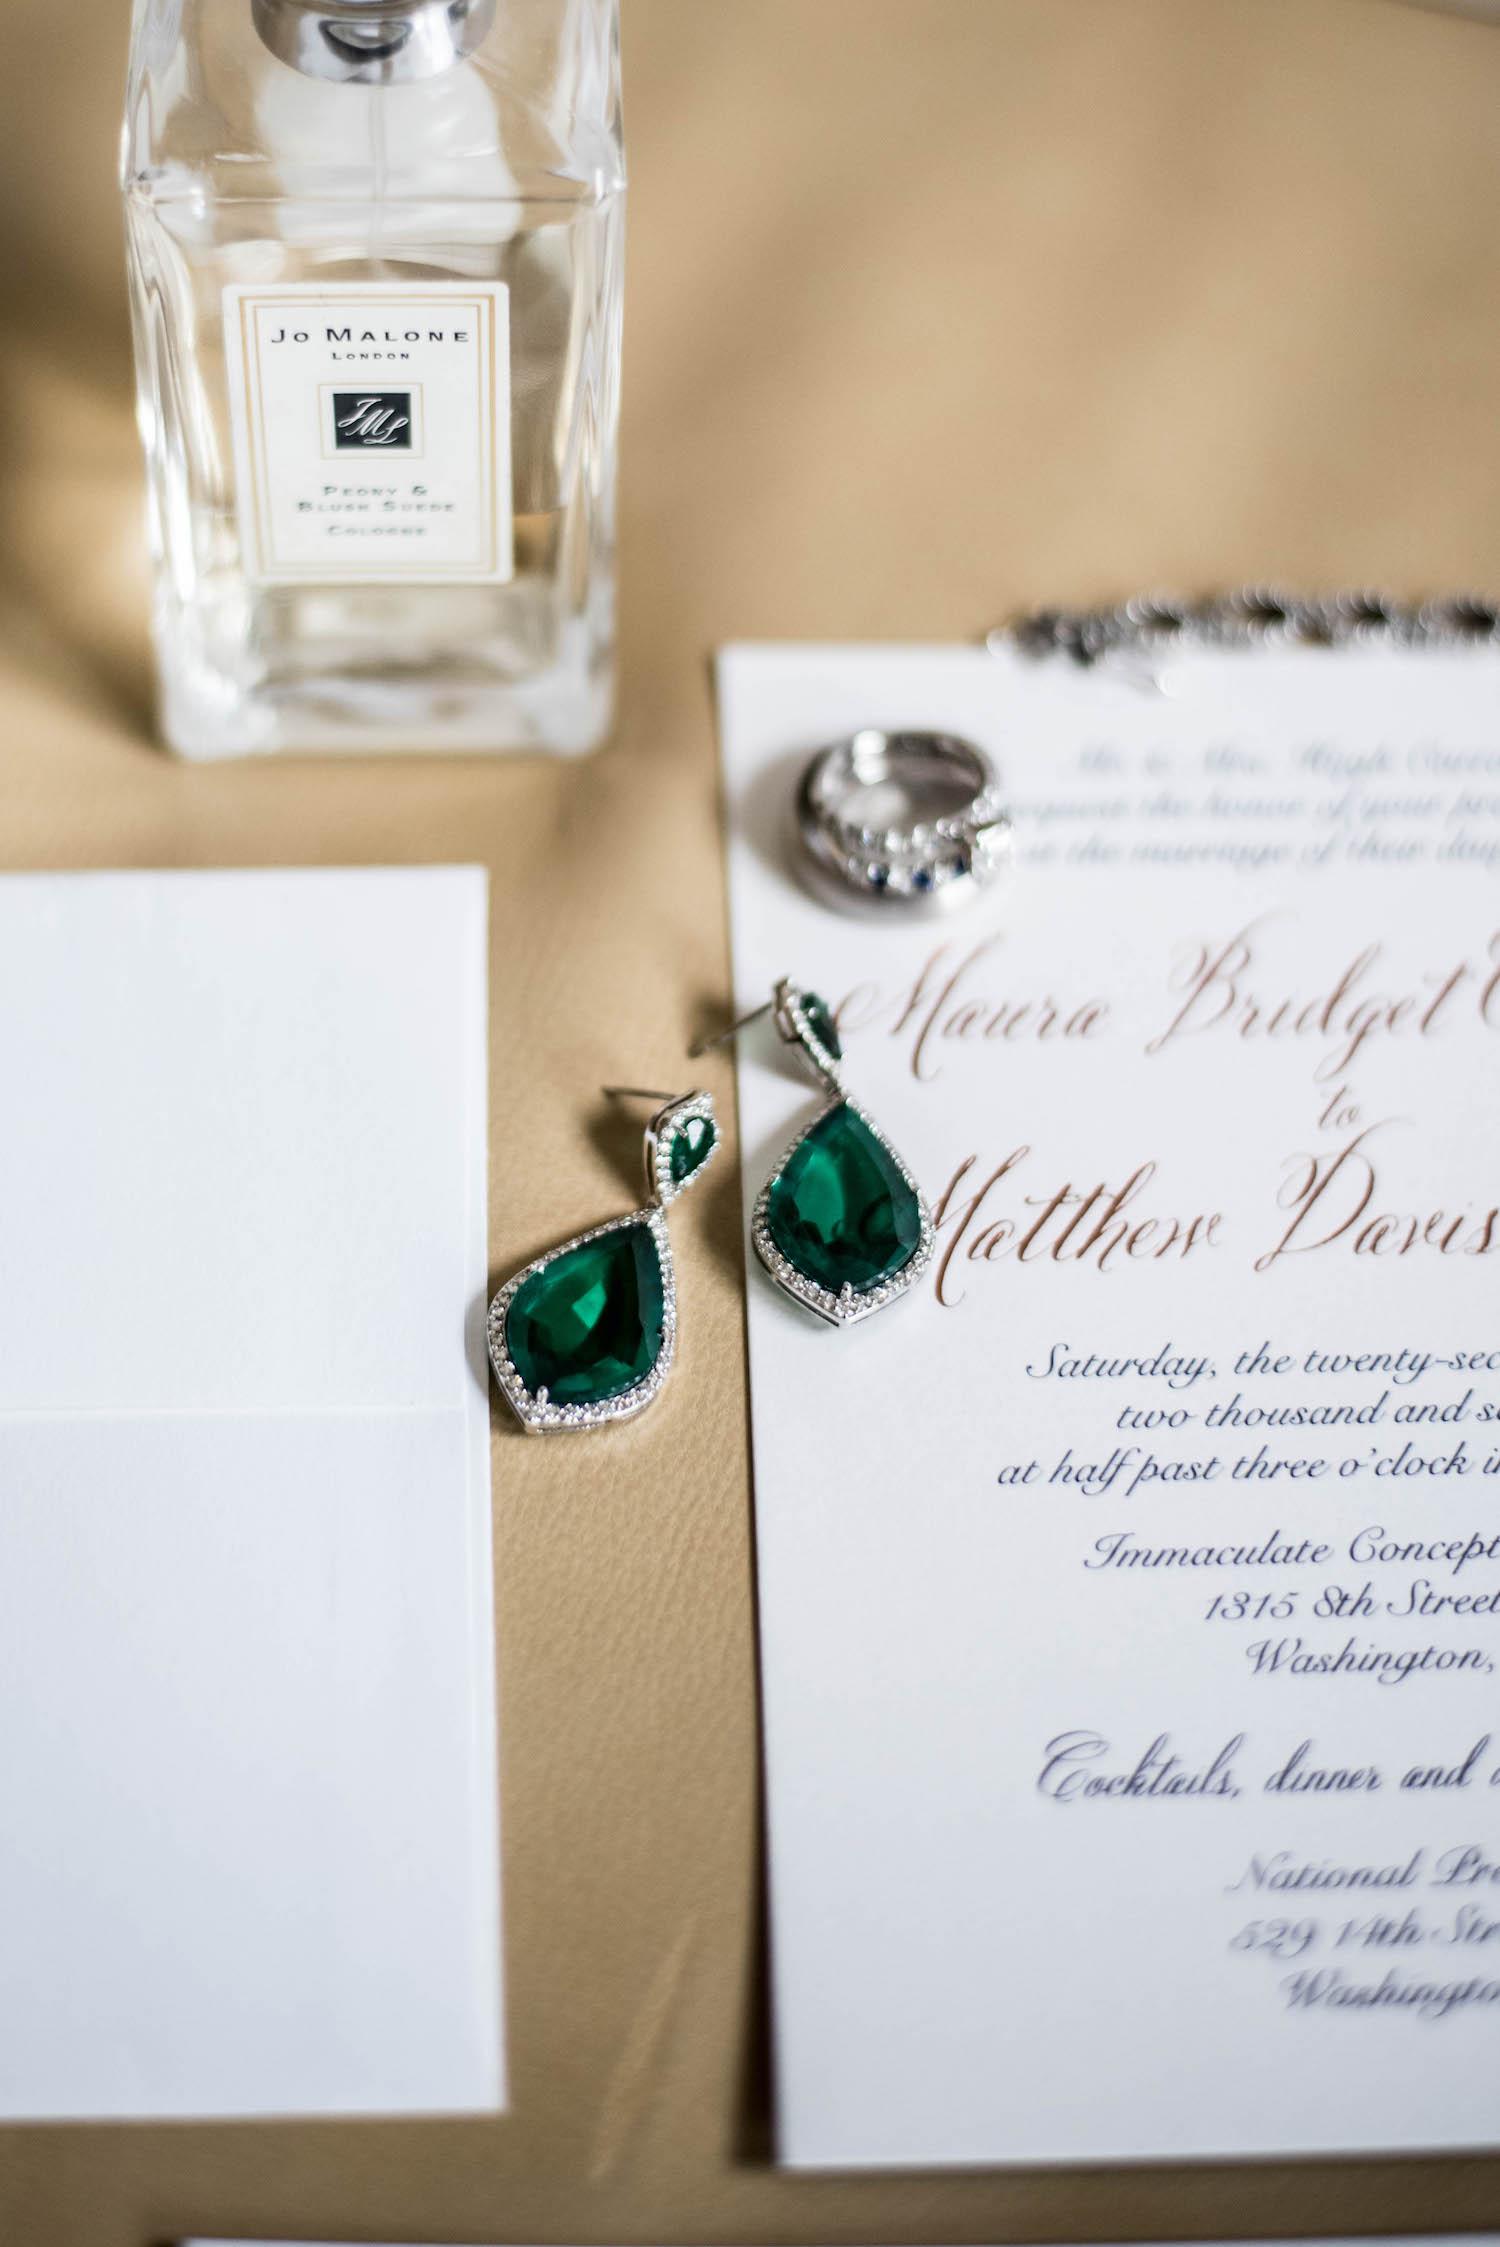 Washington DC Wedding - Sincerely Pete Events - Erin Tetterton Photography - Emerald Earrings